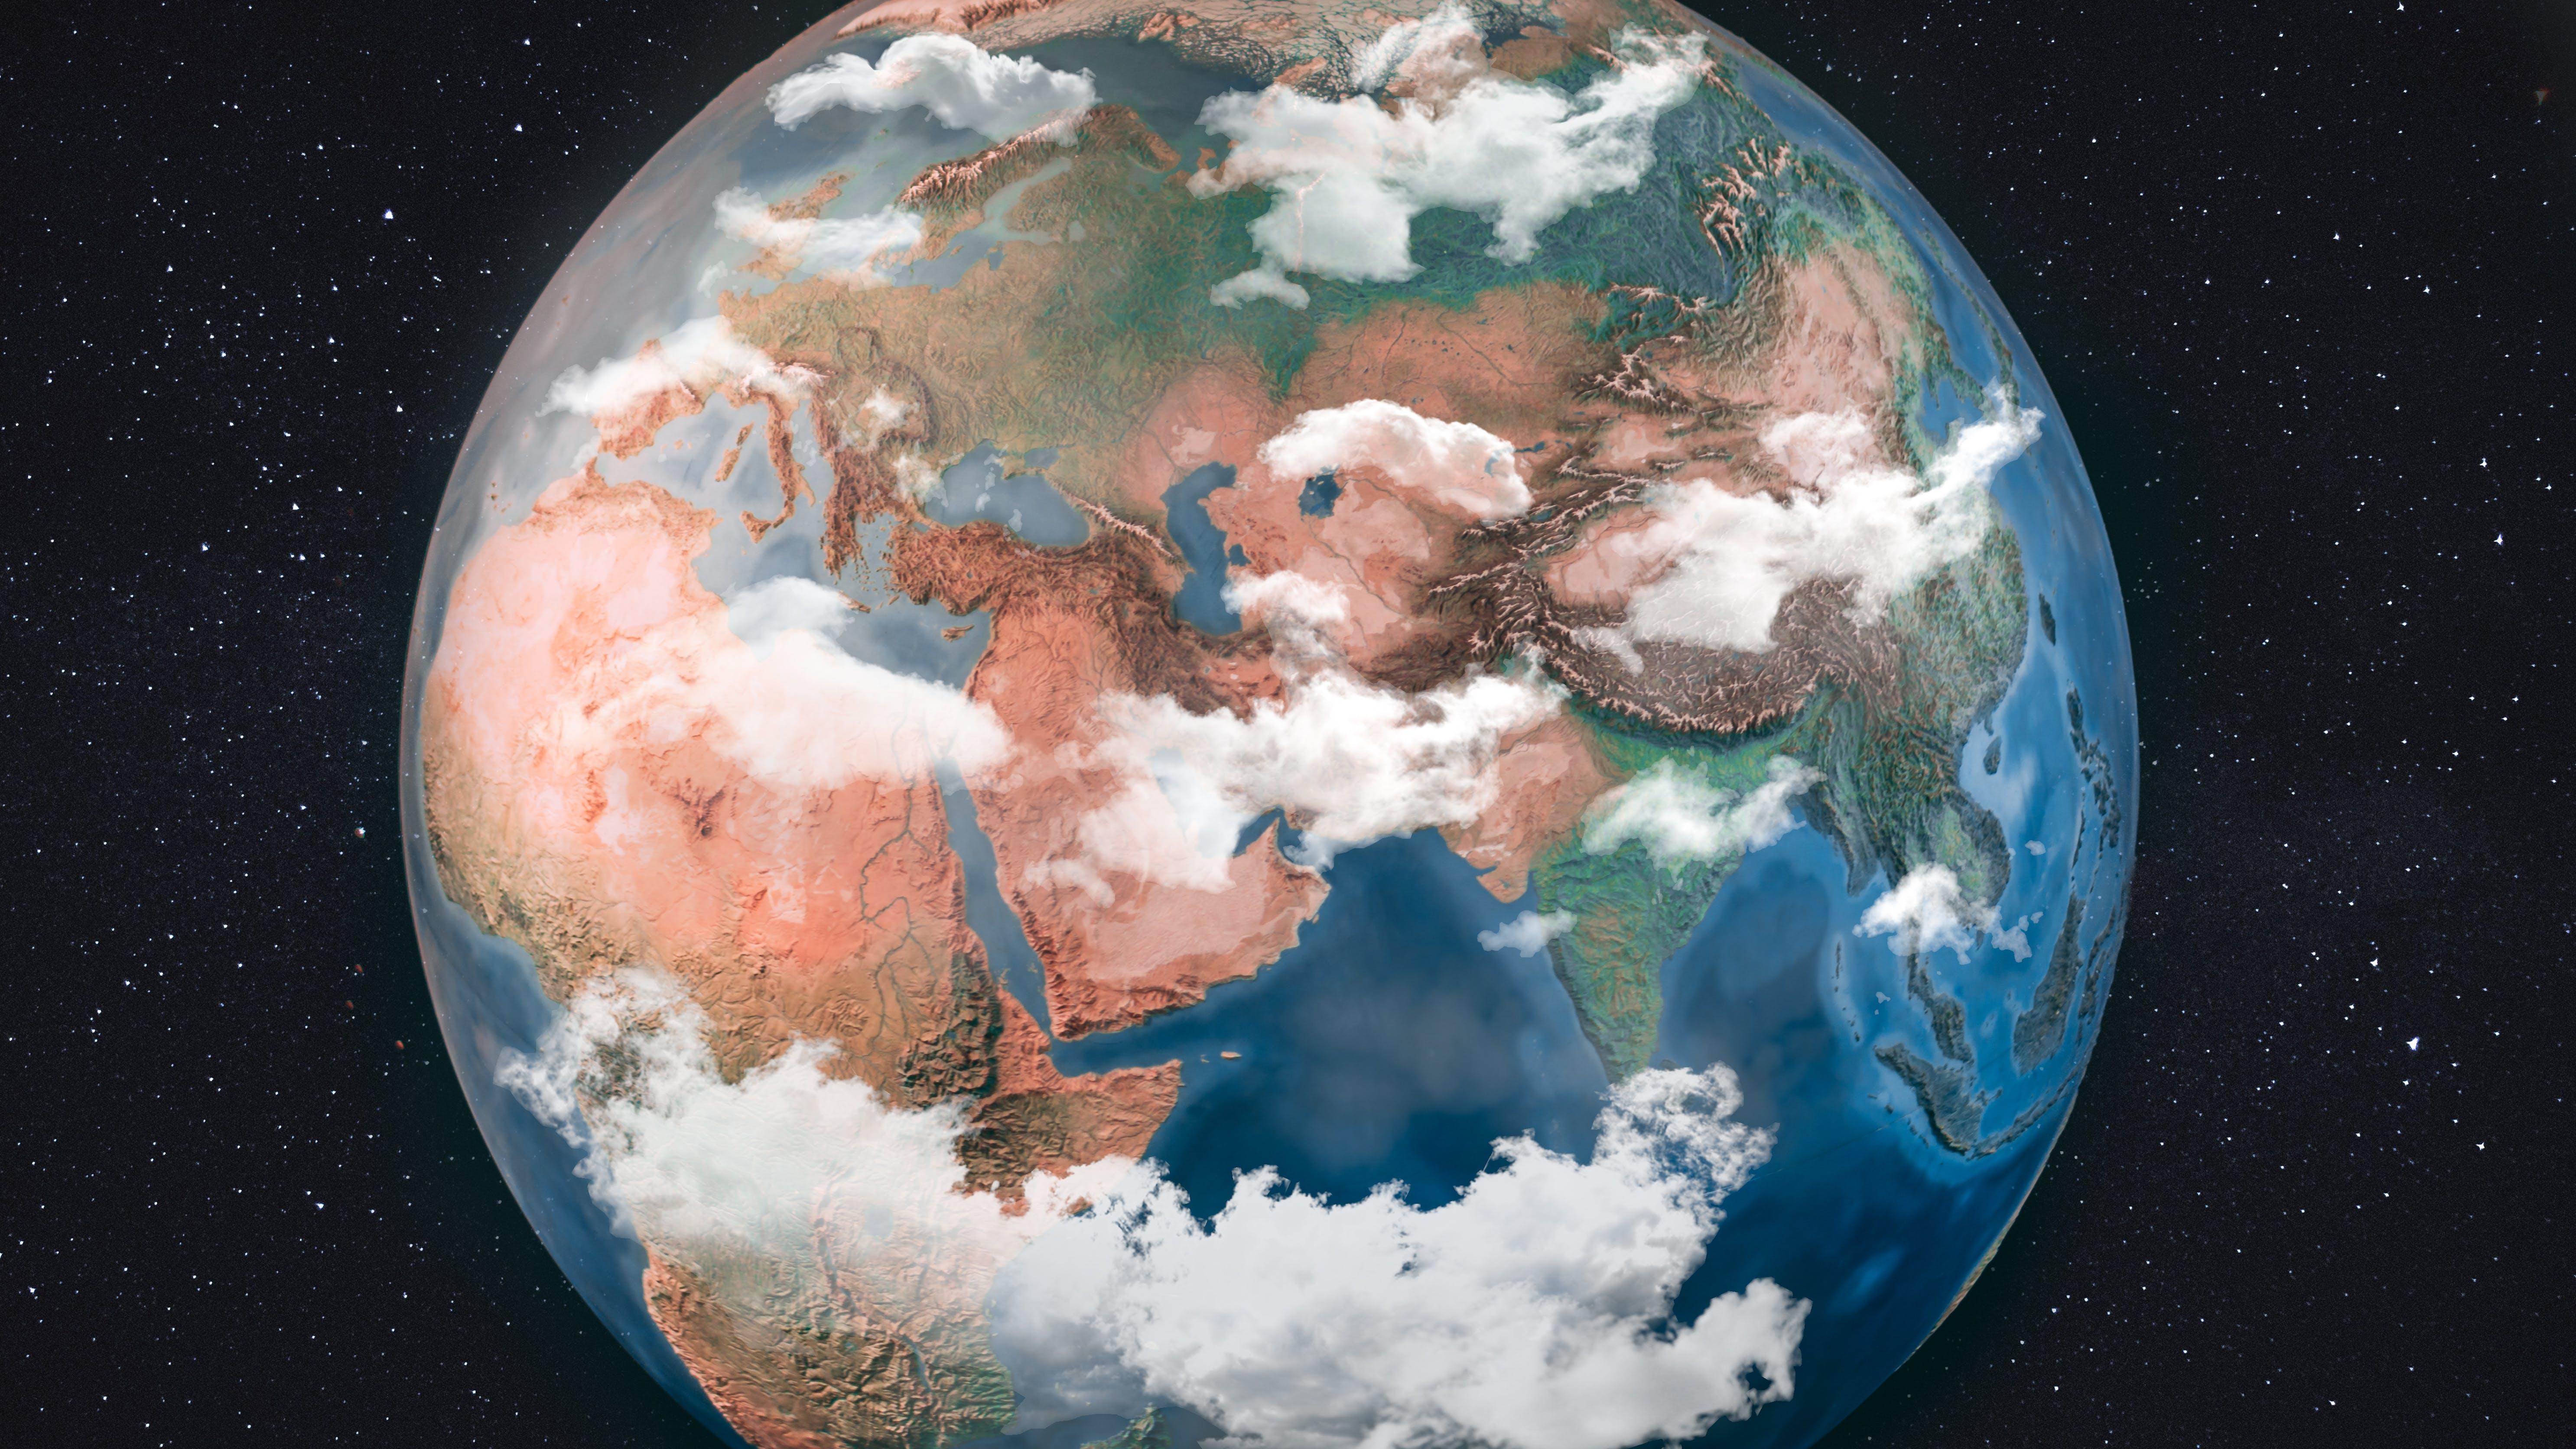 Kostnadsfri bild av geografi, jord, planet, rymden